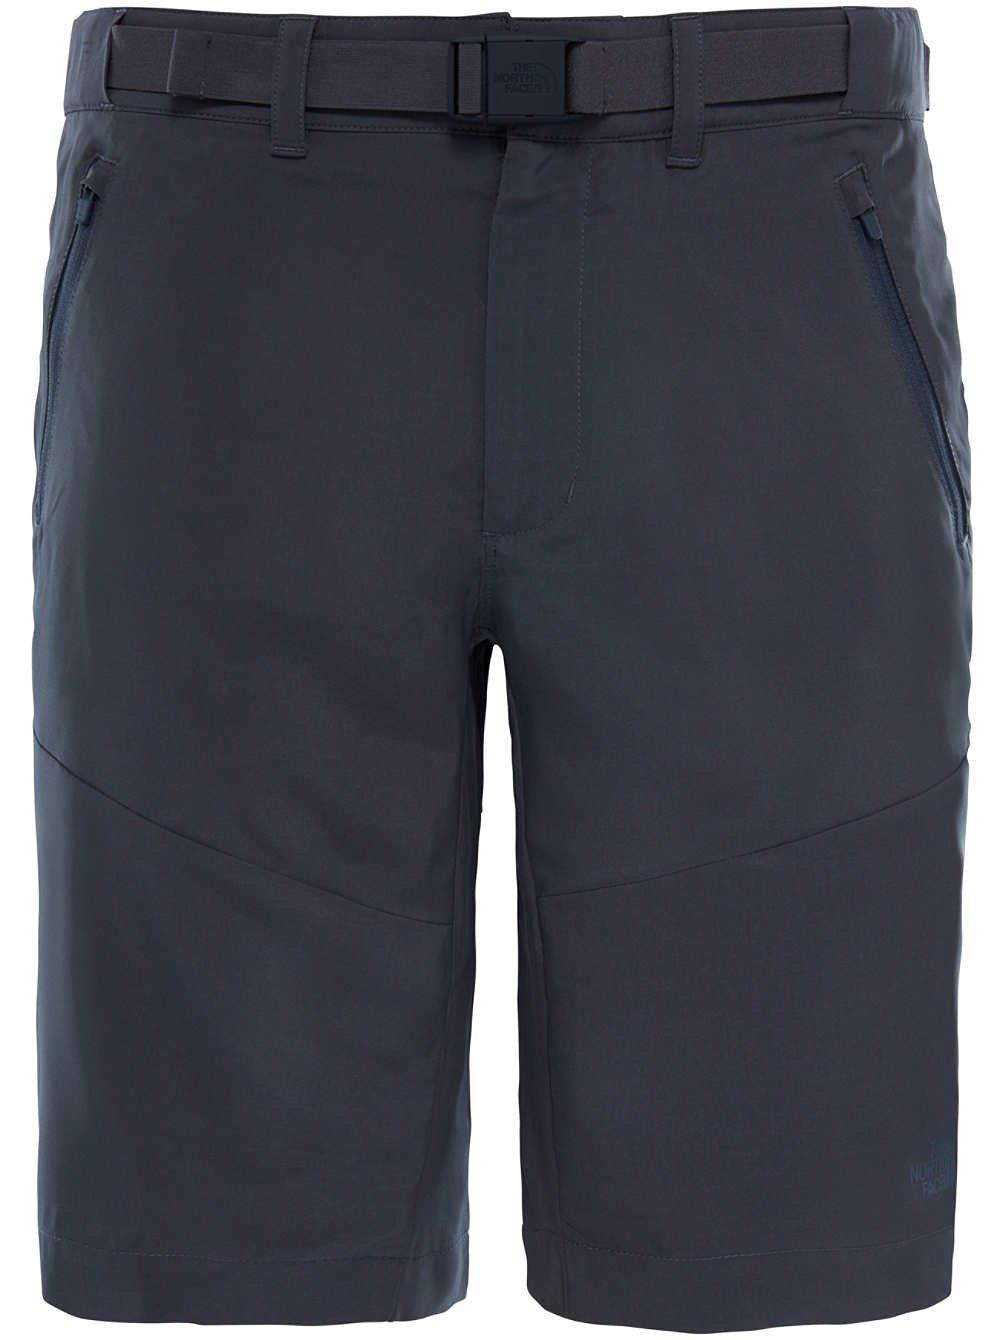 THE NORTH FACE 3jyh Shorts, Kurze